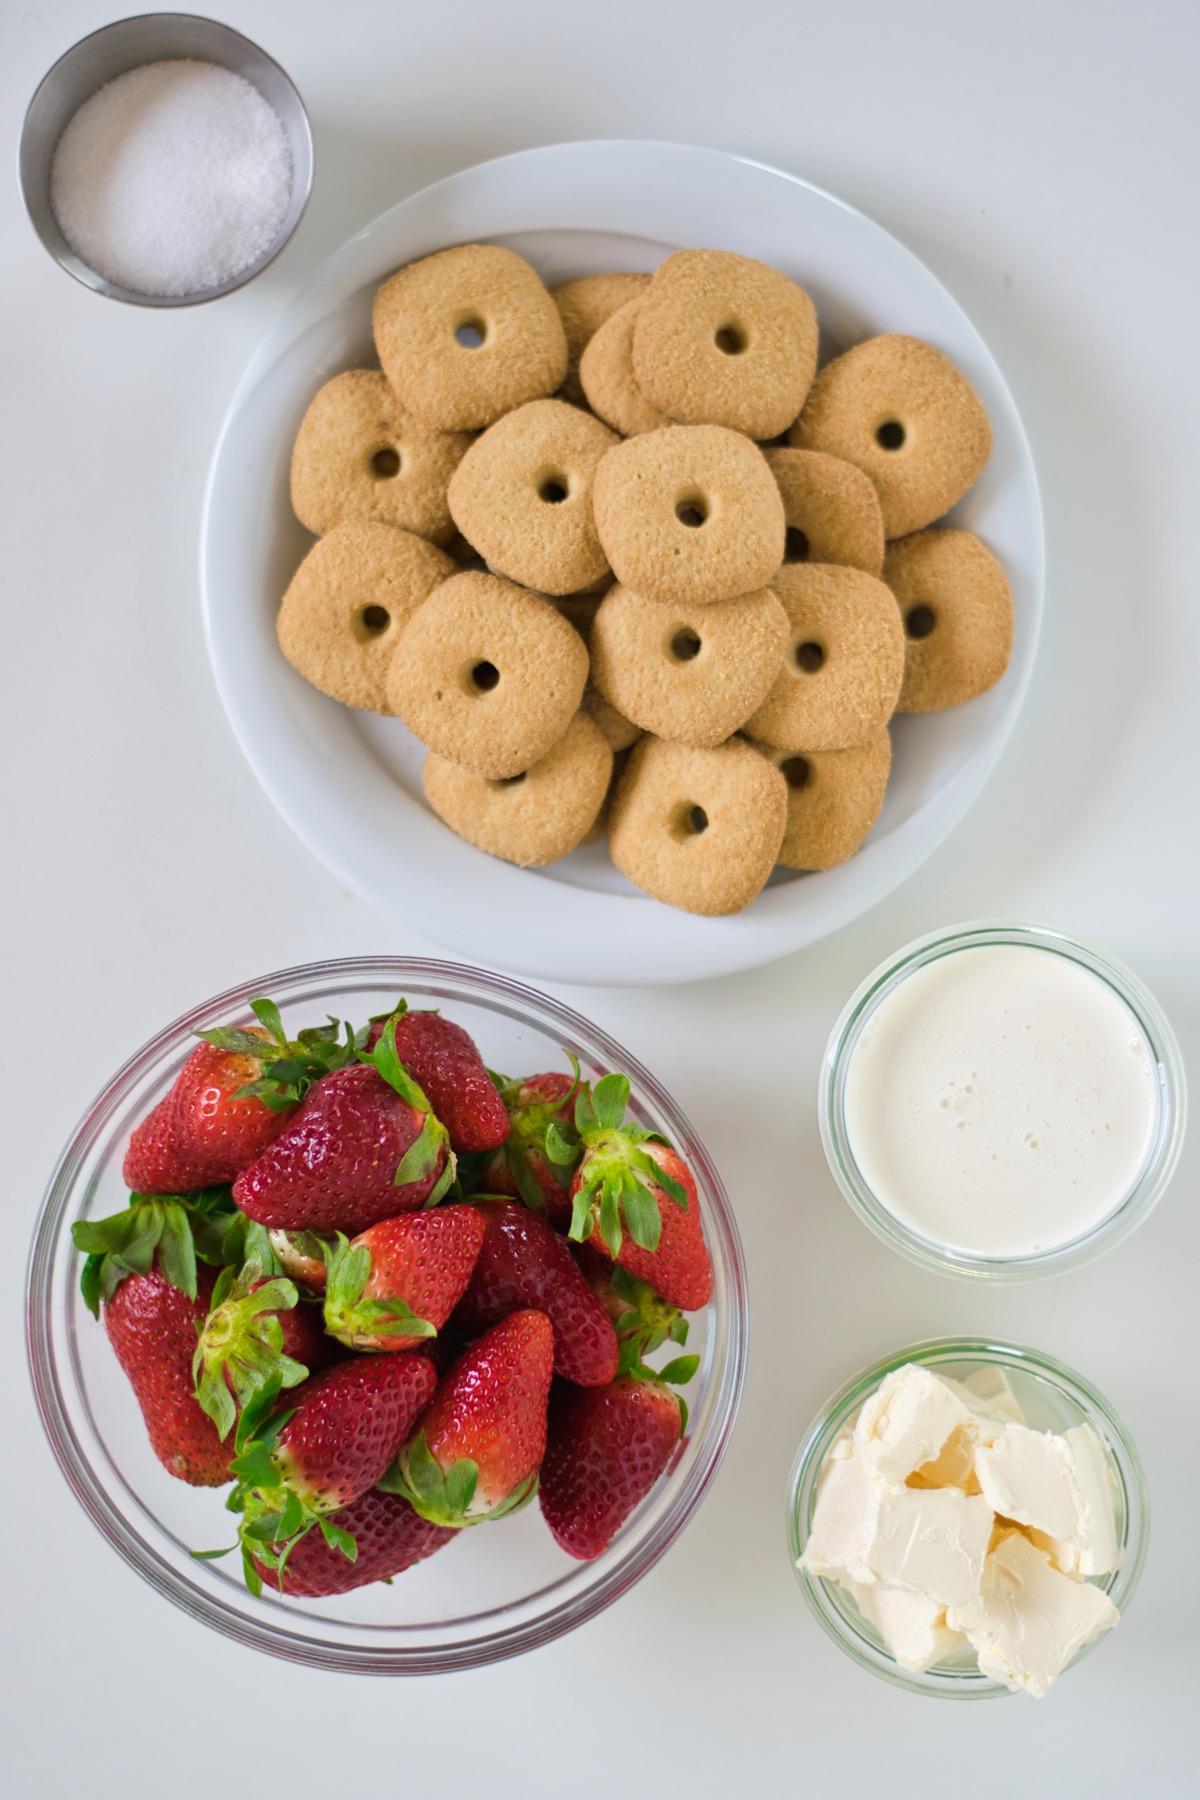 supplies to make a fresh strawberry cream crumble pie